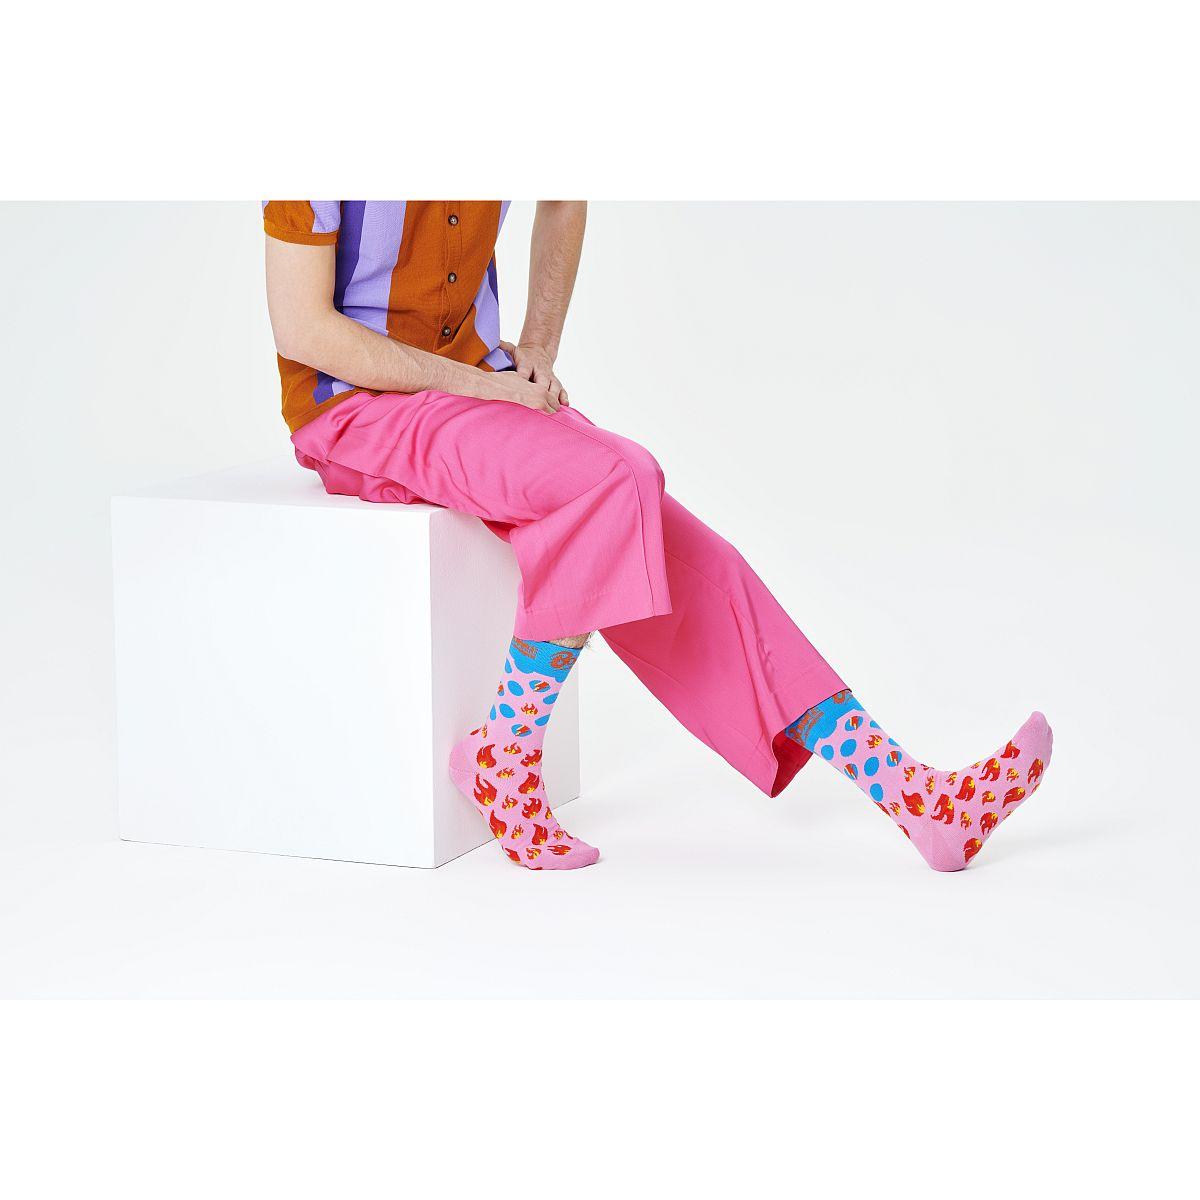 Aladdin Sane Sock